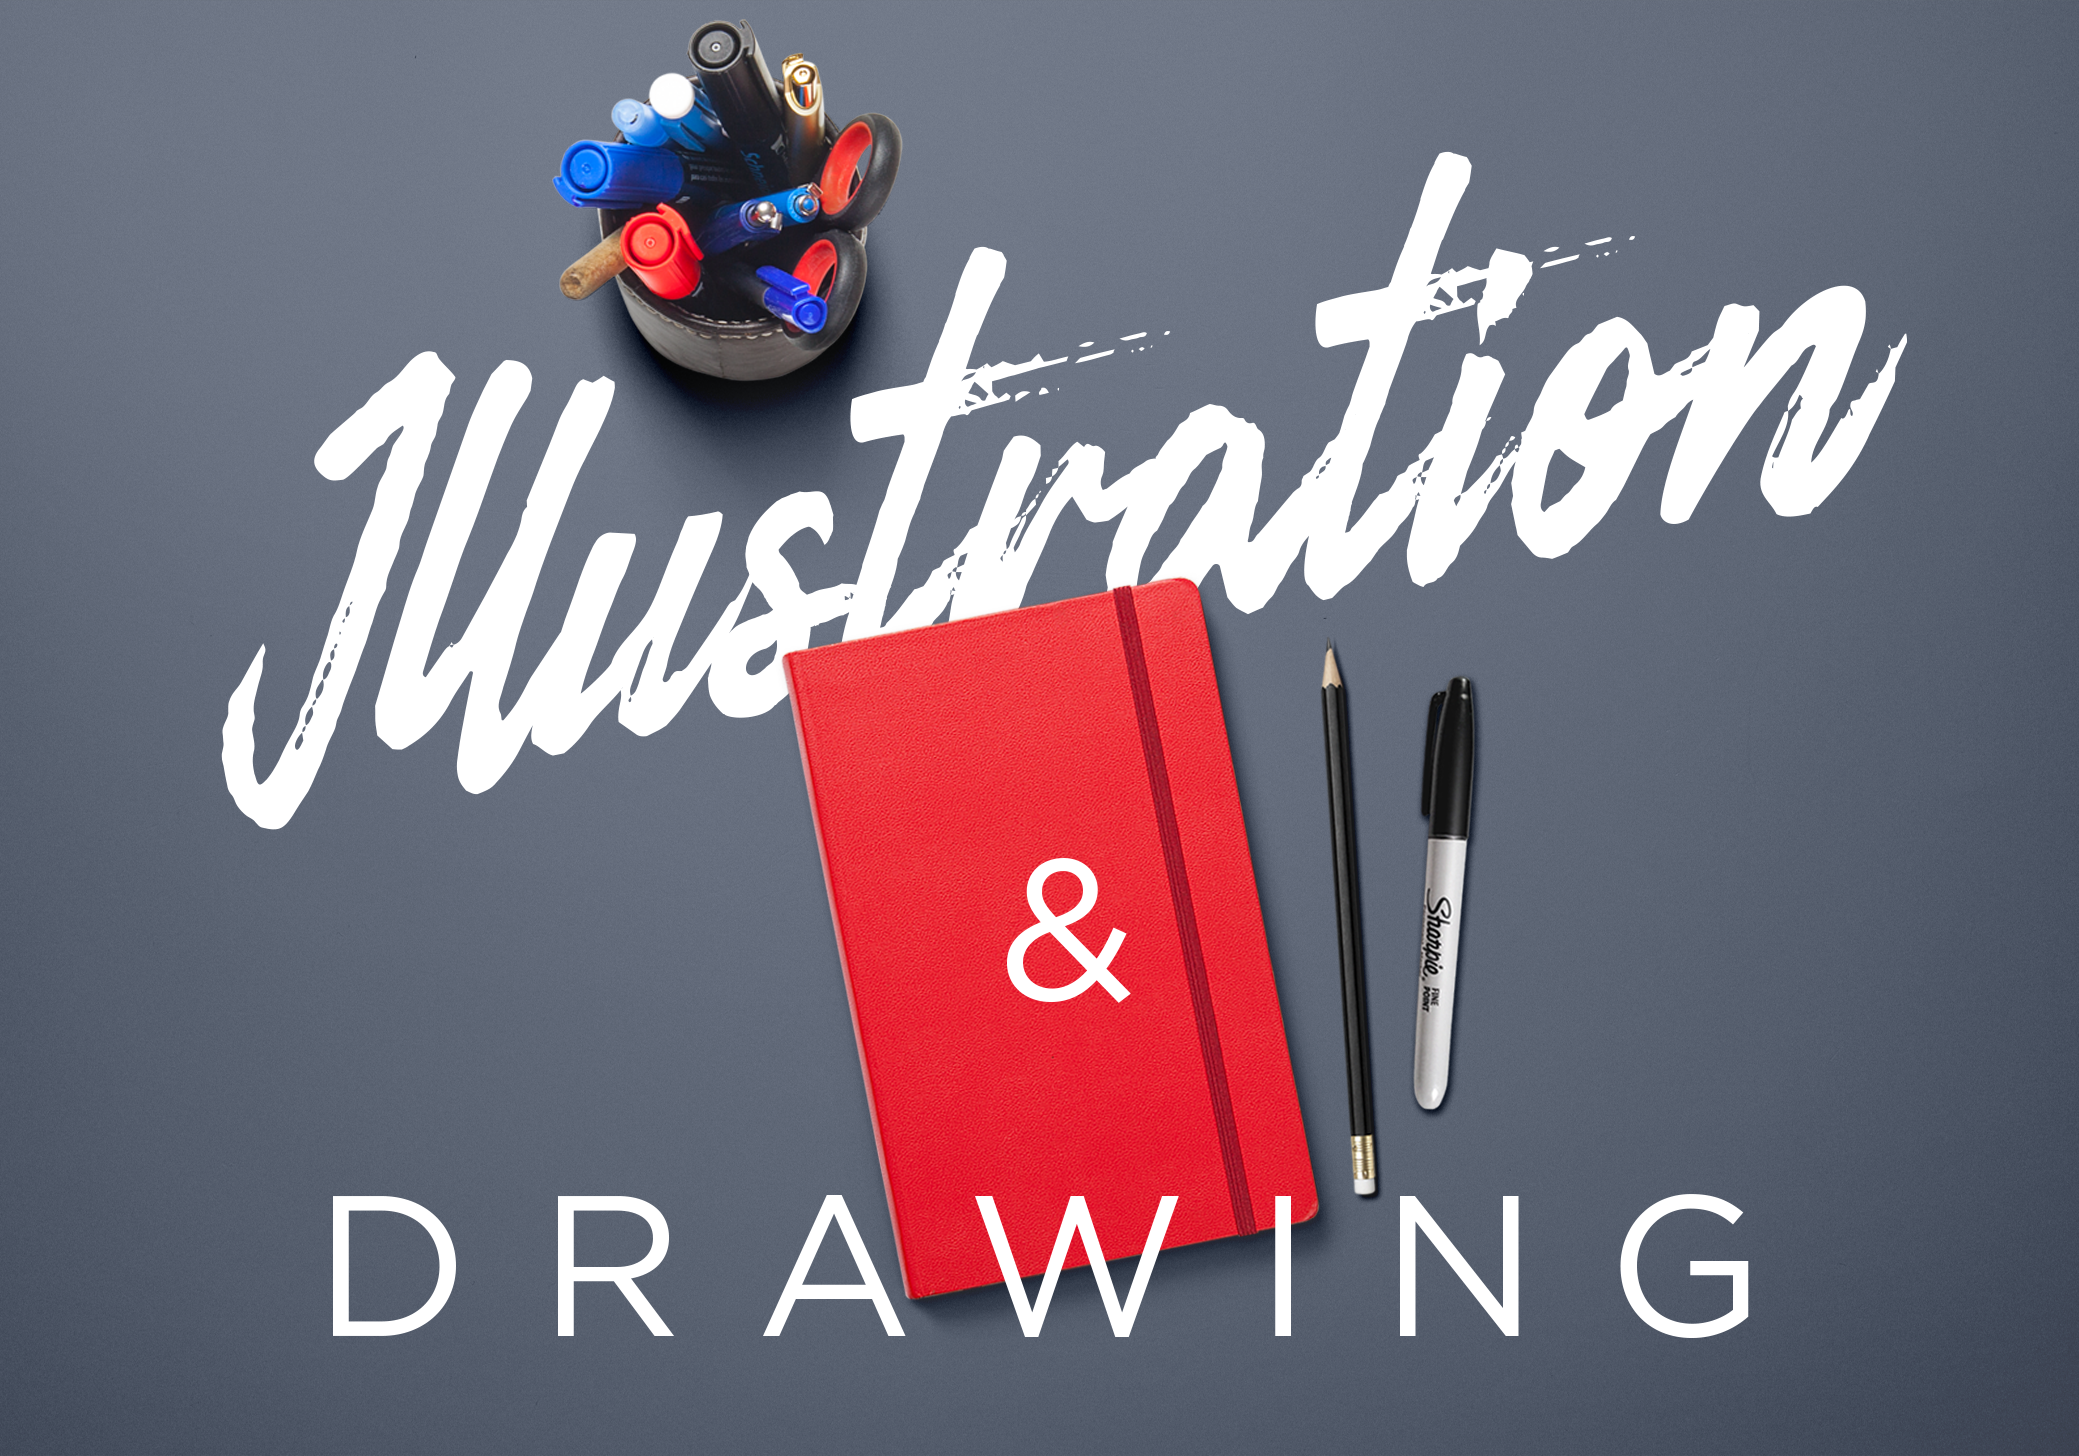 Be smart, illustration